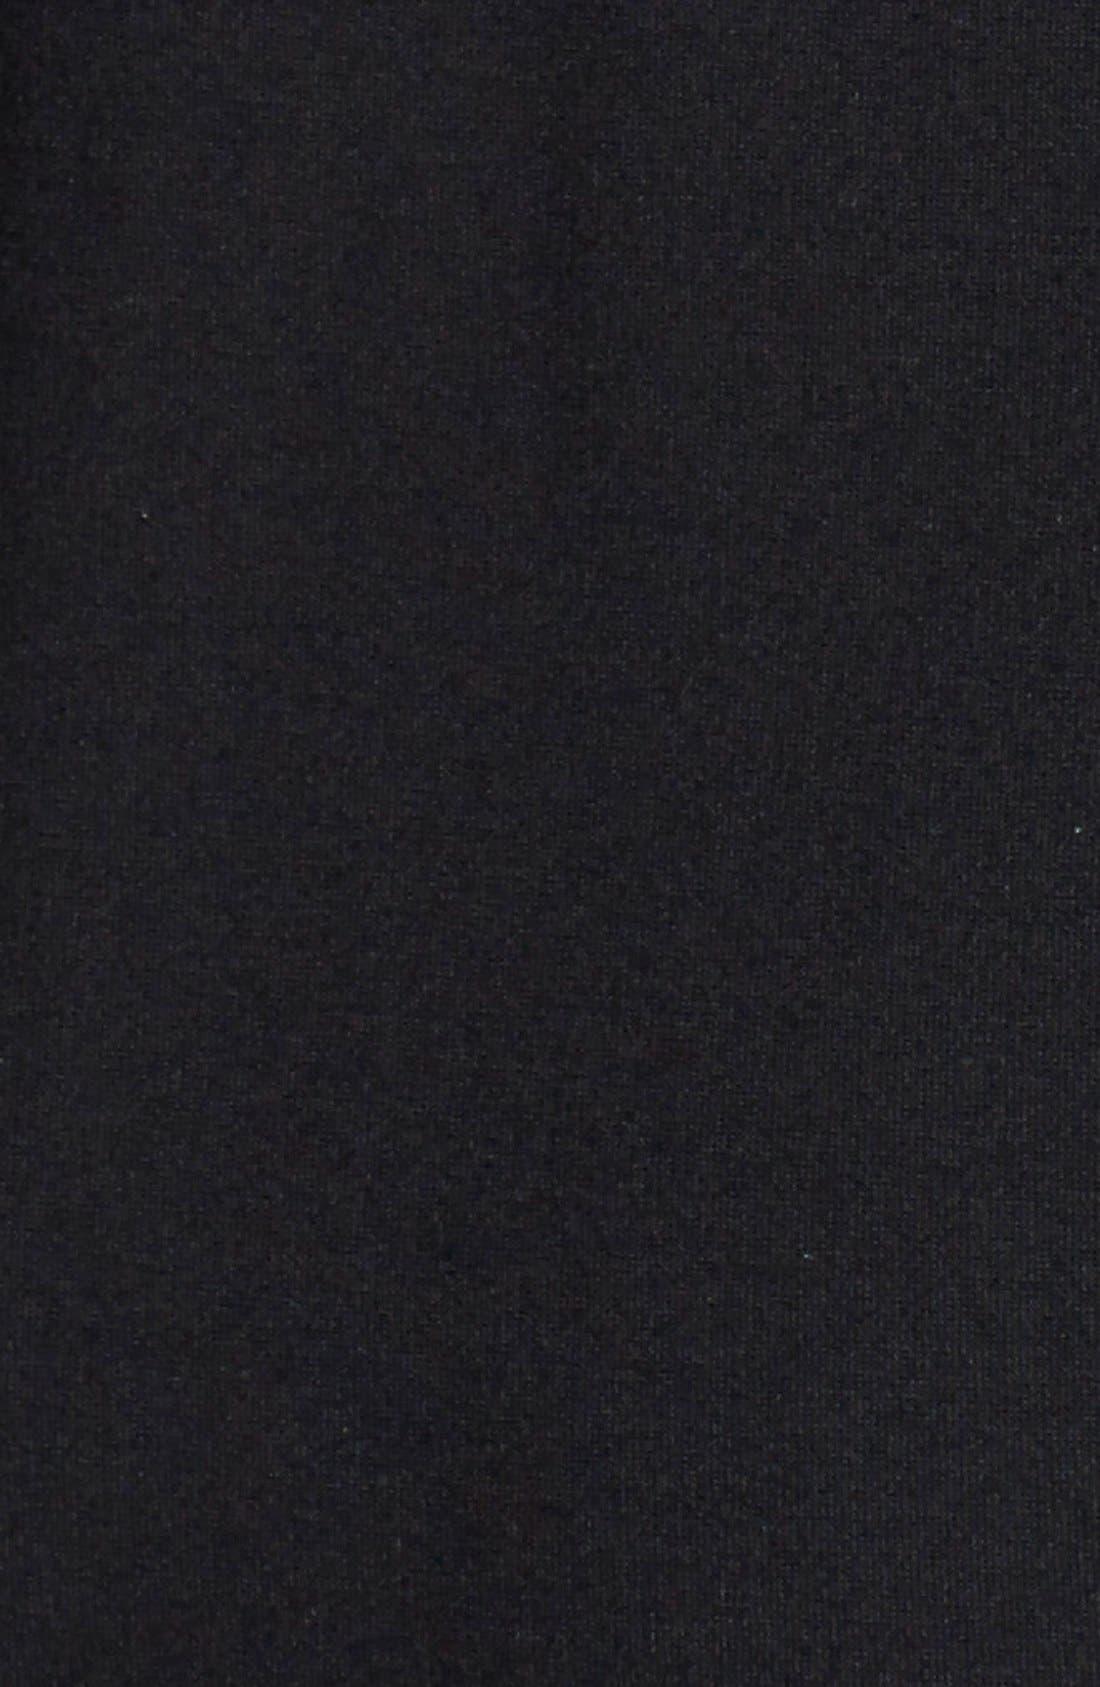 TAHARI, Pleat Detail Long Sleeve Ponte Sheath Dress, Alternate thumbnail 4, color, 001